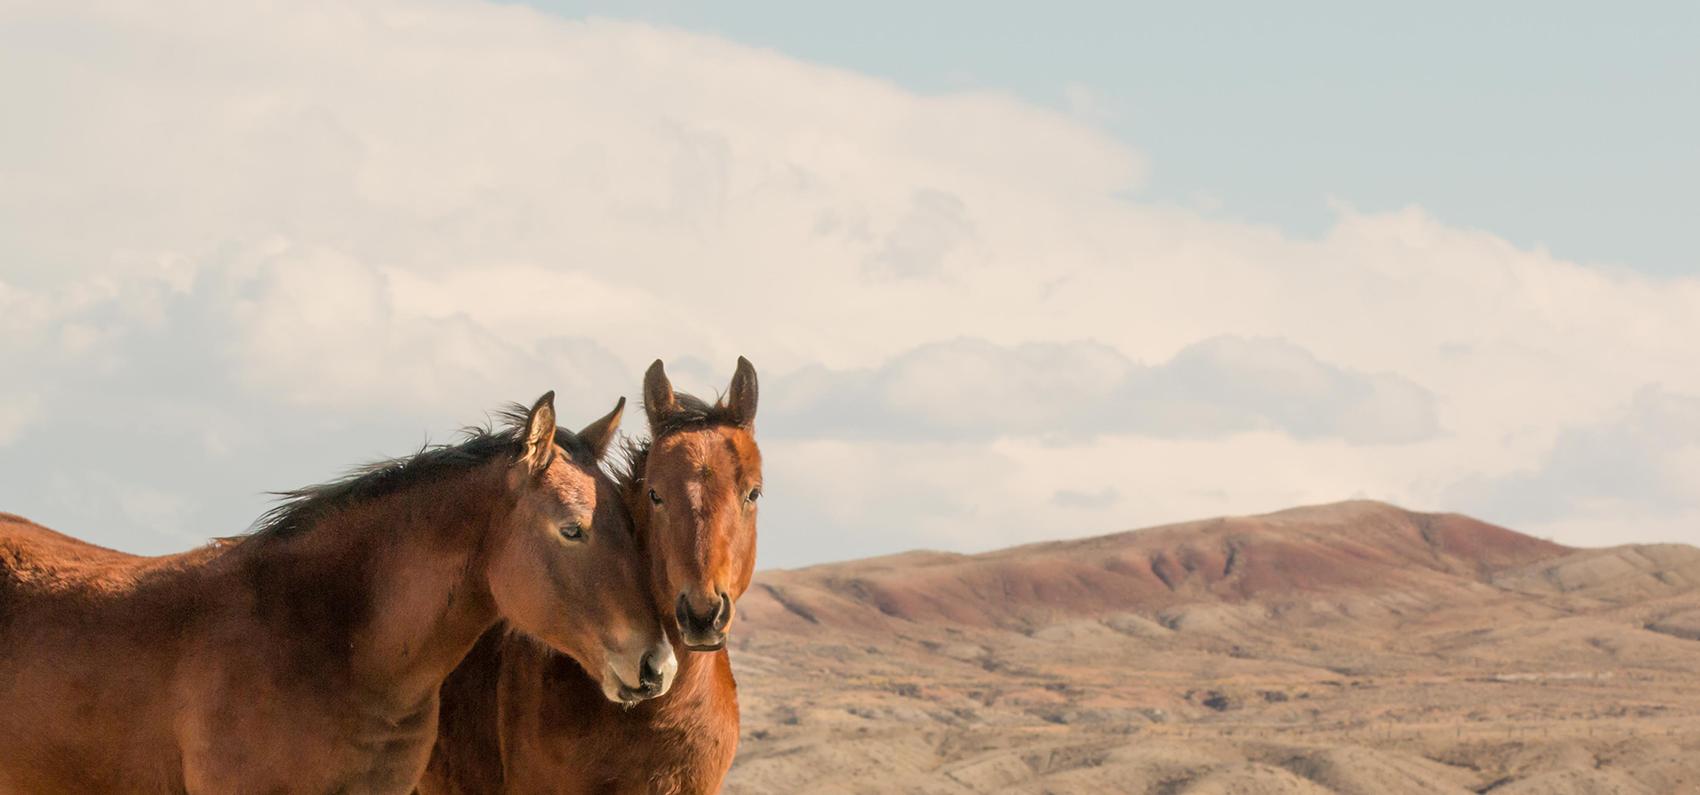 two wild horses nuzzle